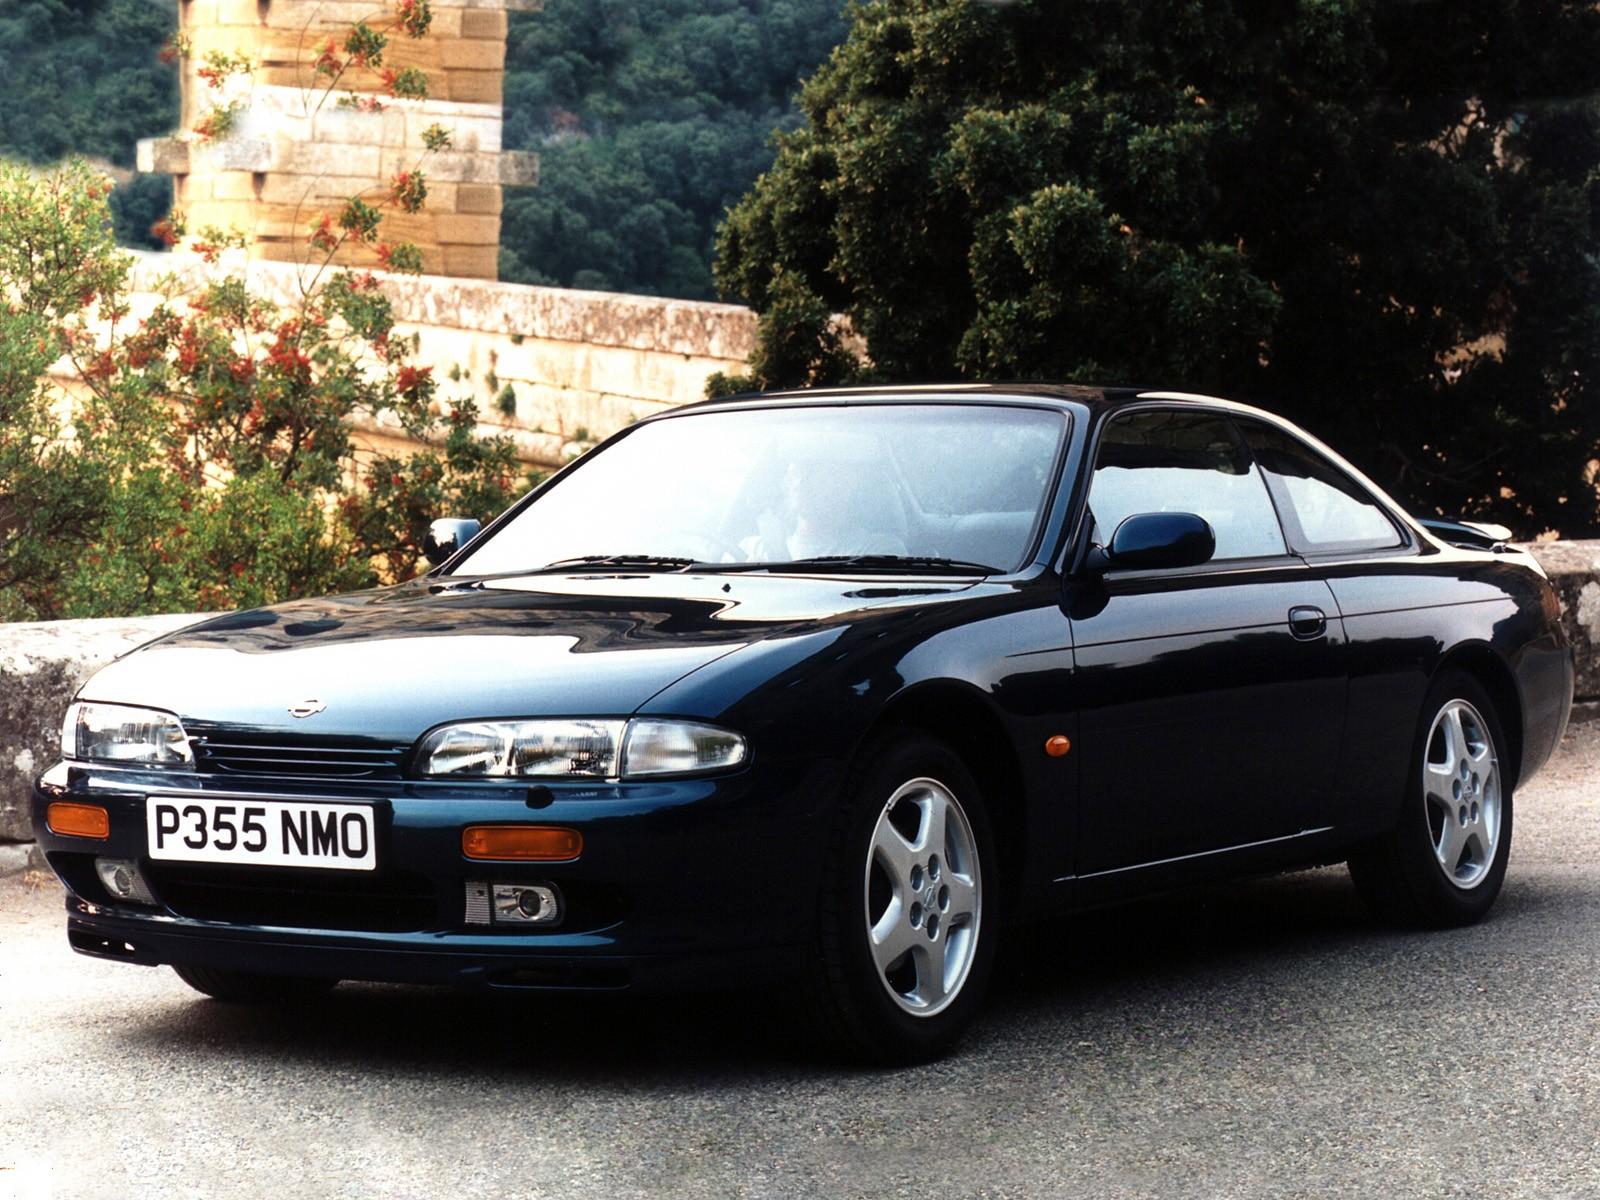 Nissan 200 Sx 1994 1995 1996 1997 1998 1999 2000